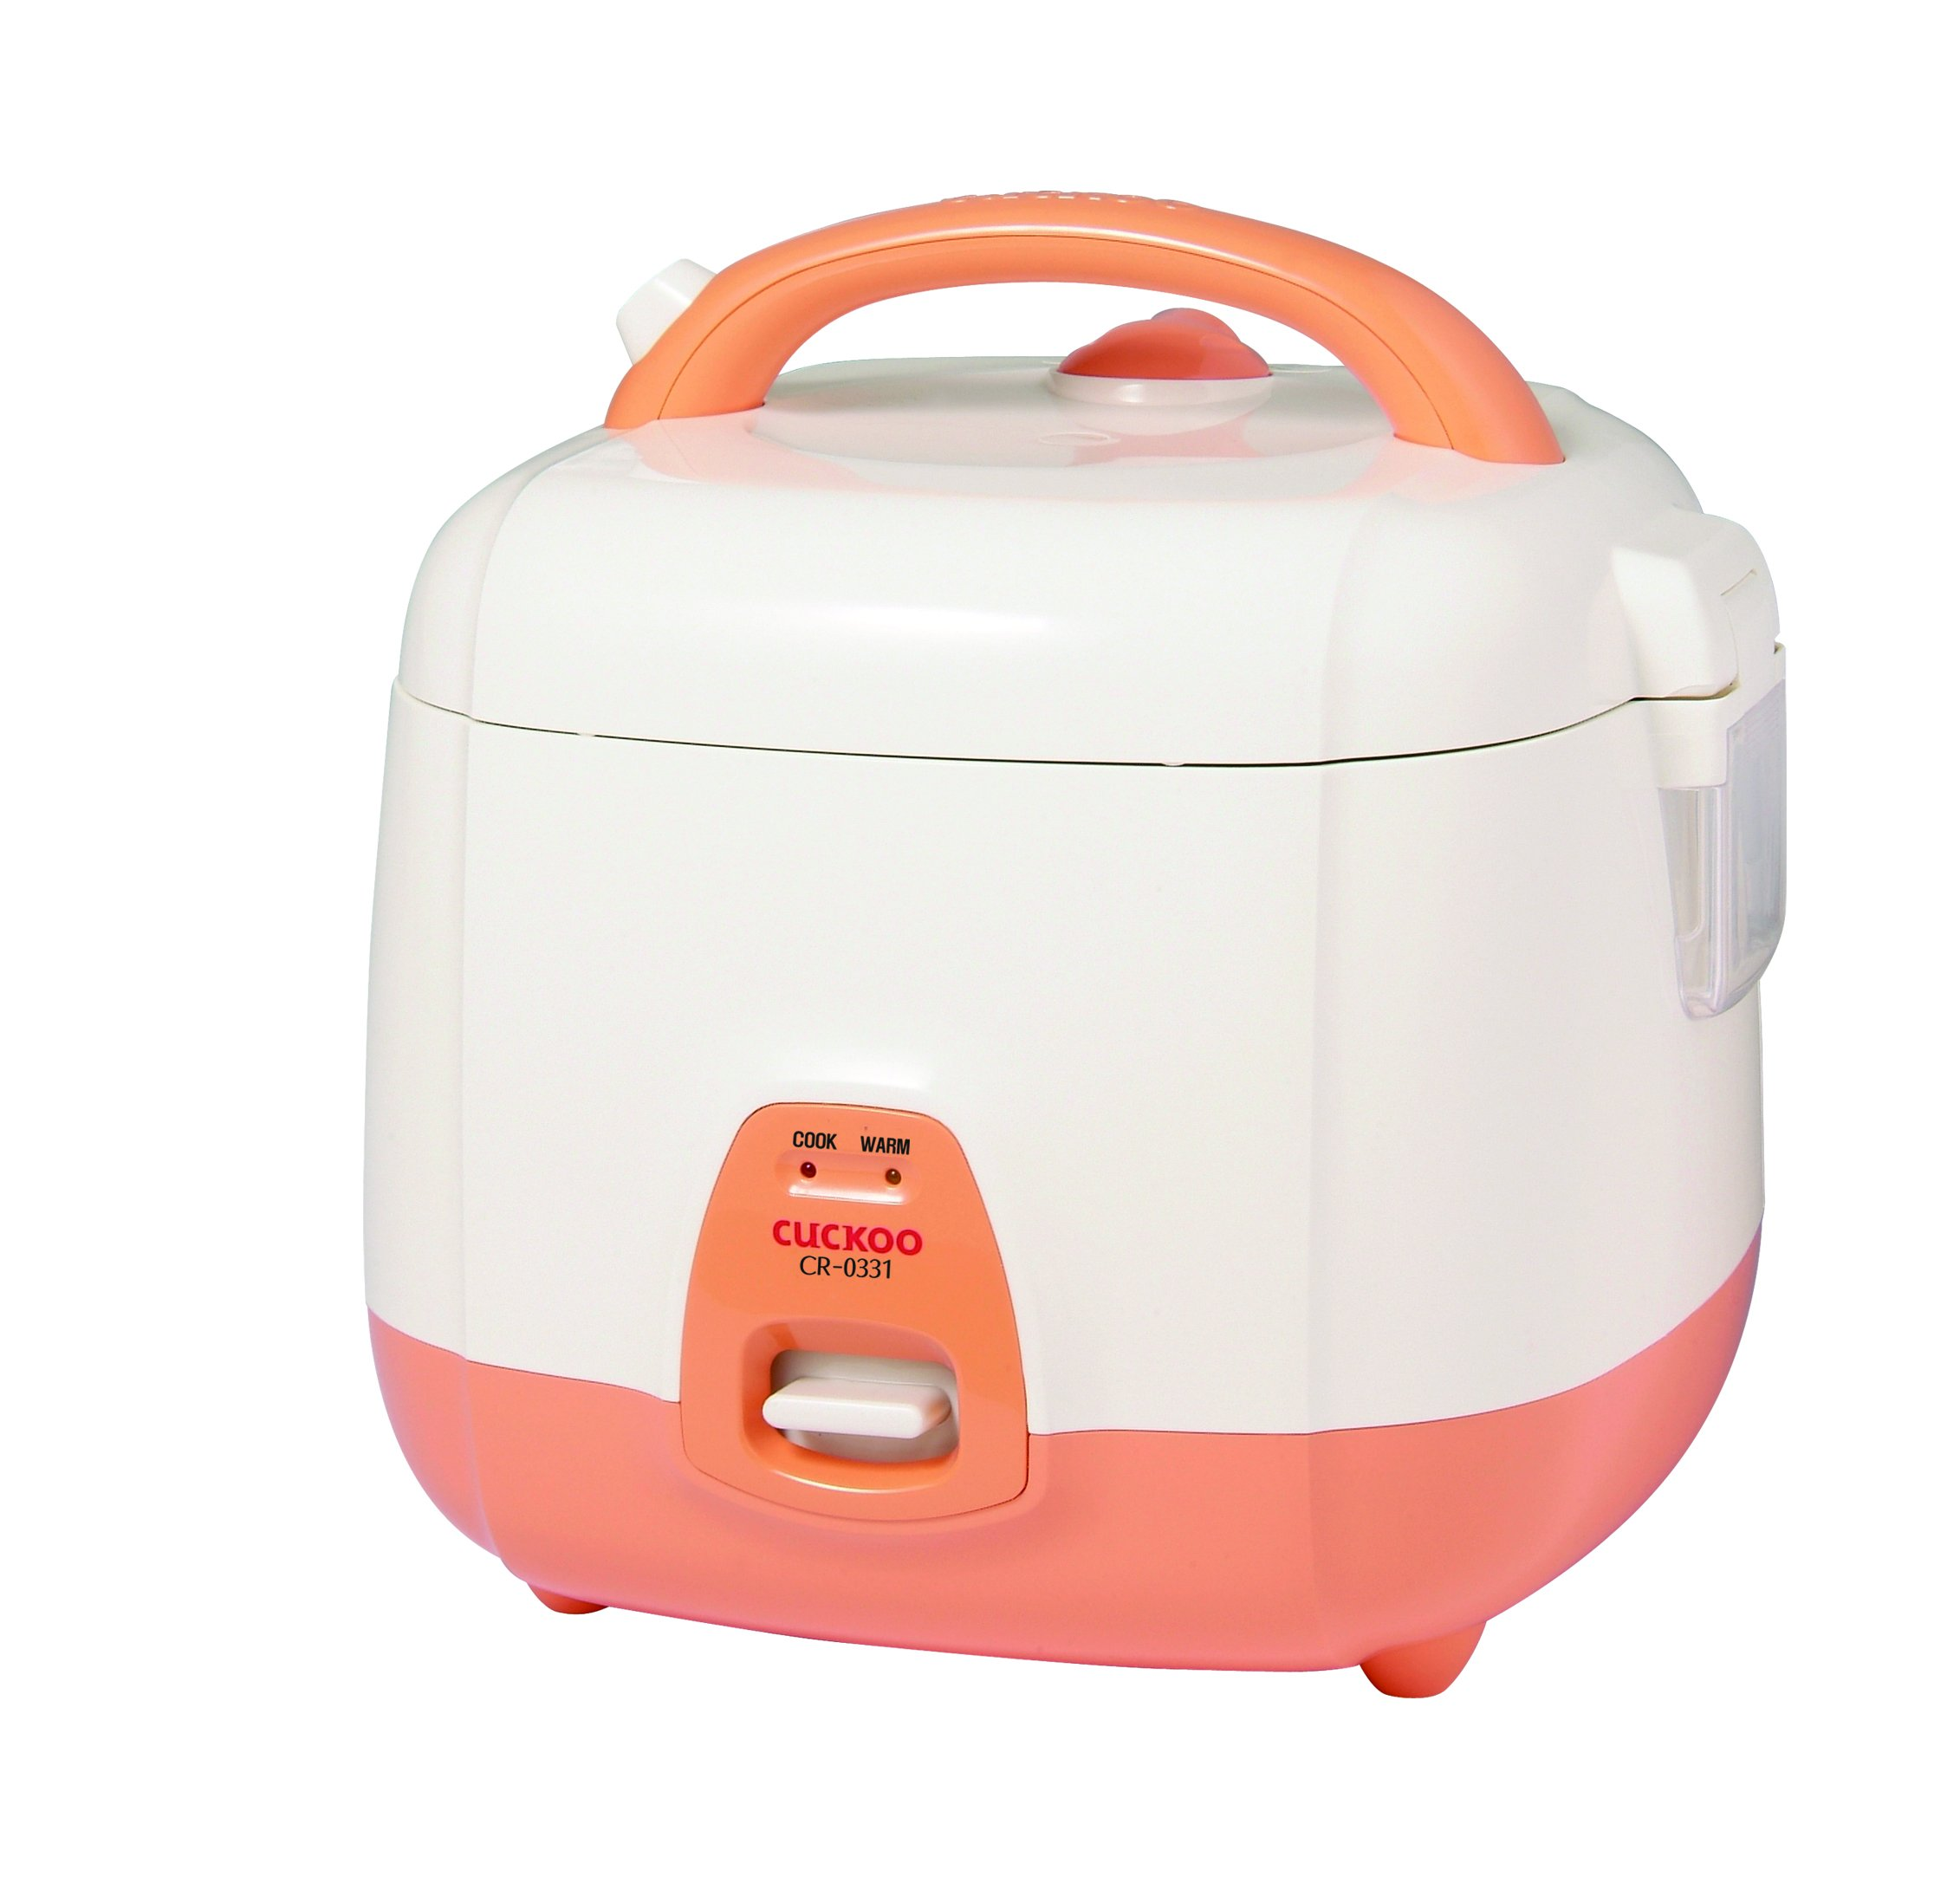 Cuckoo CR-0331 Rice Cooker, 3 Cups Uncooked (1.5 Liters / 1.6 Quarts), Orange